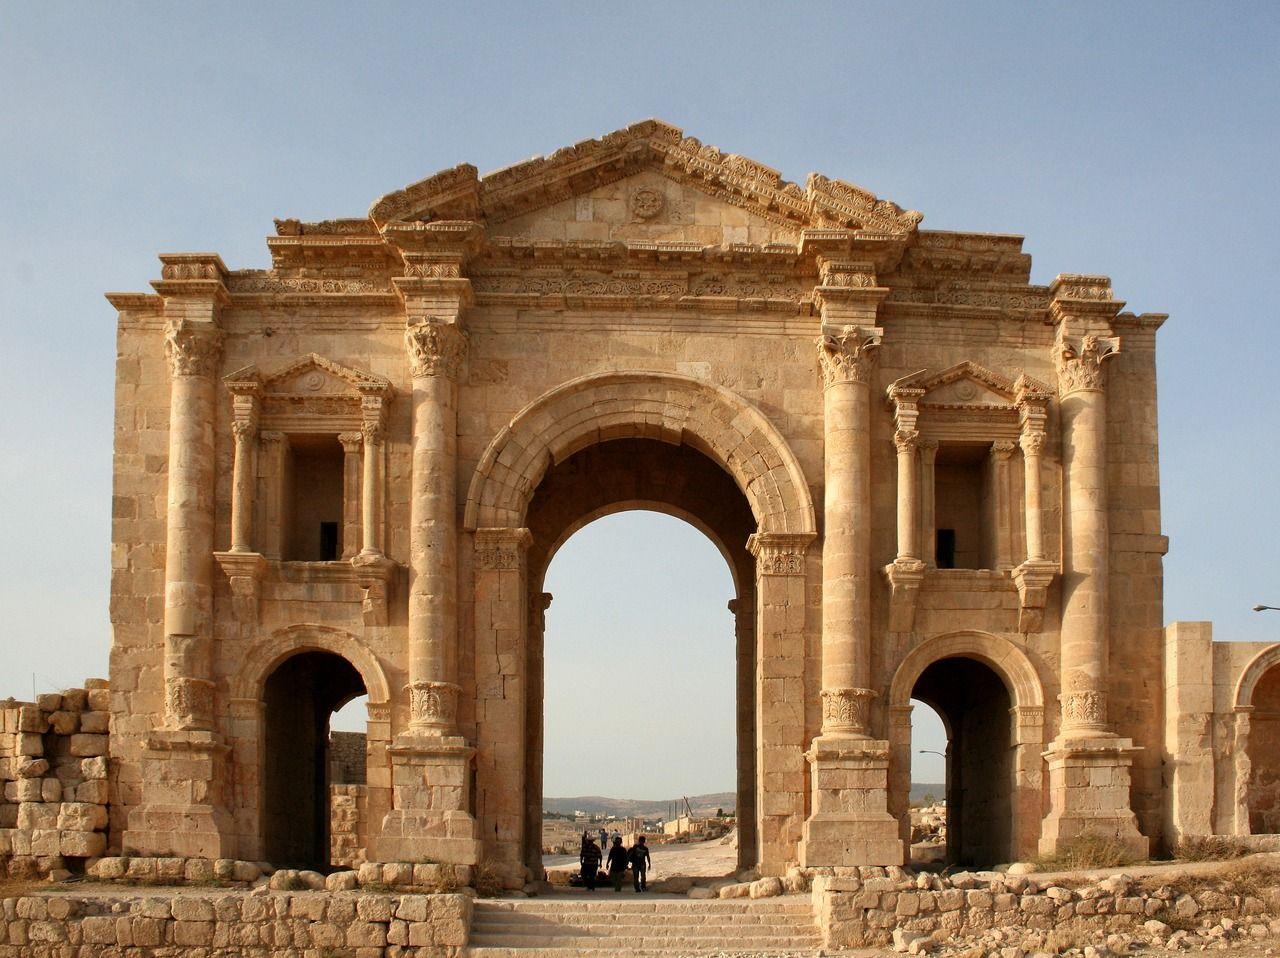 Roman Architecture Arches the ancient roman arch of hadrian, jerash, jordan. photo courtesy